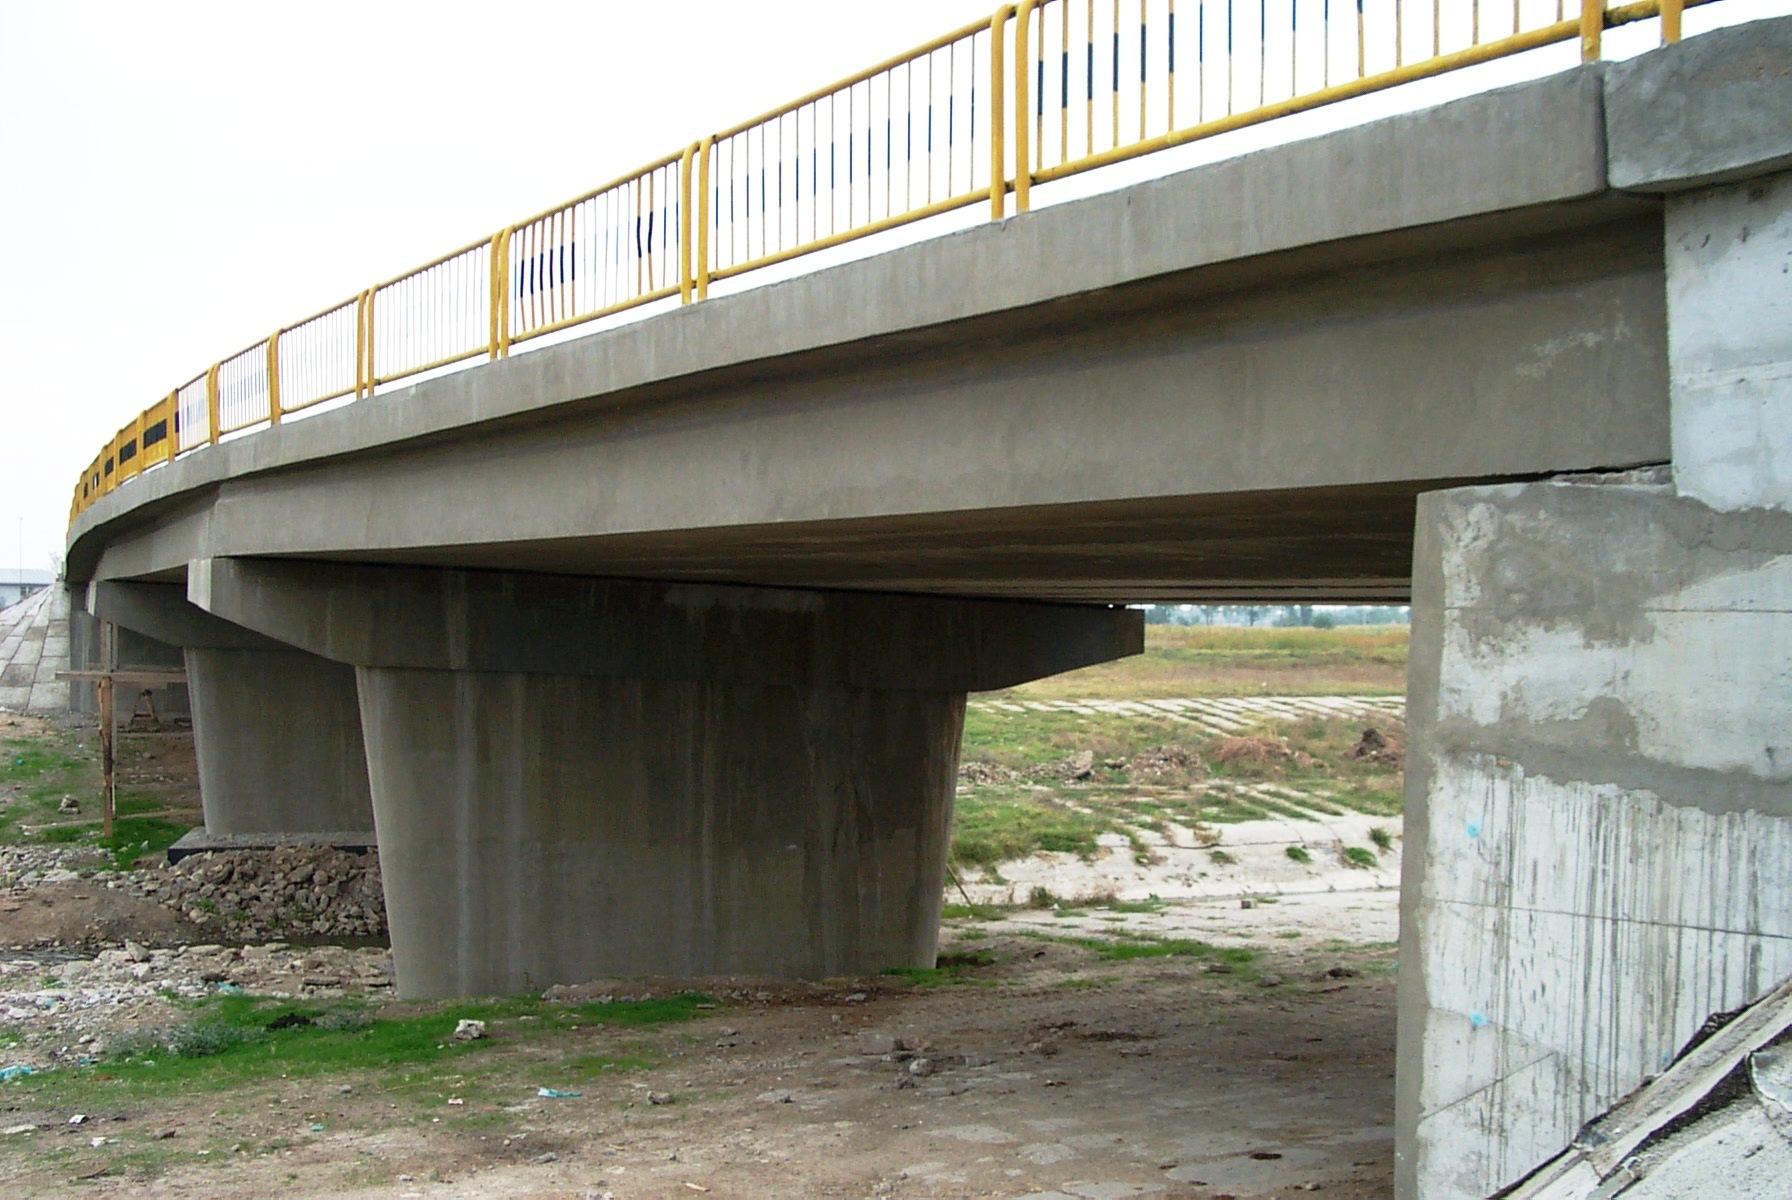 Reparatii pod (DN2), Km. 33 - 028, peste raul Calnistea MAPEI - Poza 113